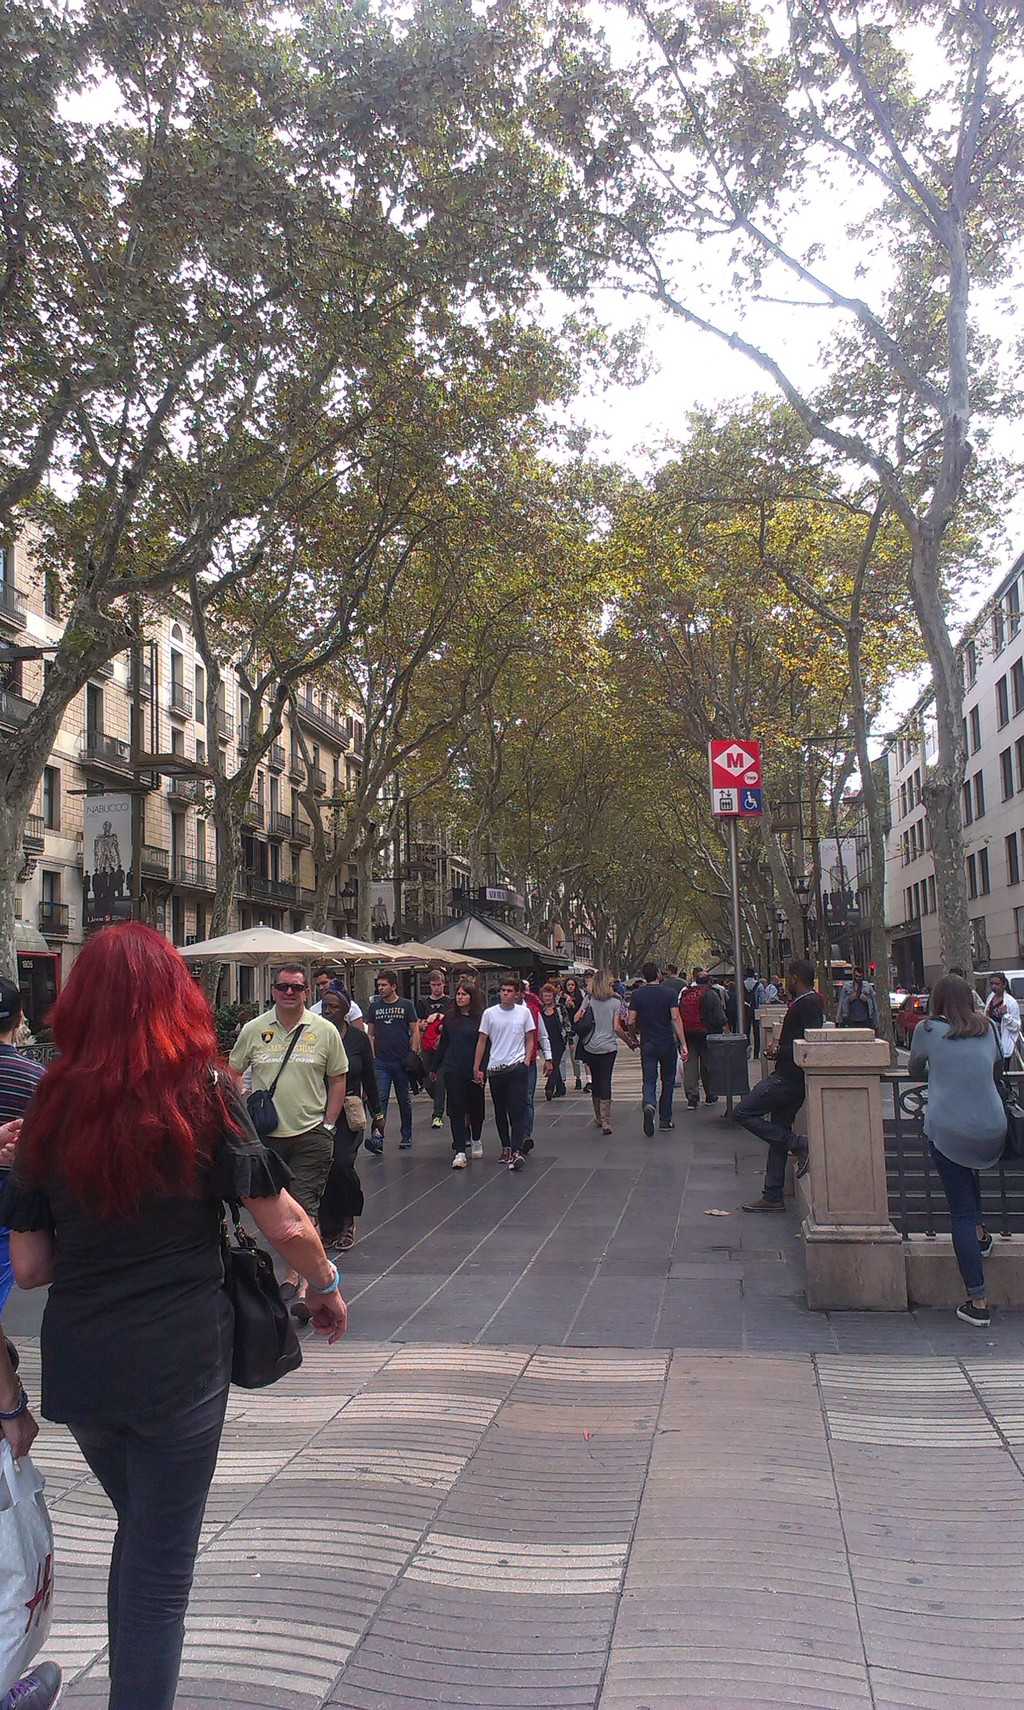 a-street-barcelona-96323707e1d2329b7f15b